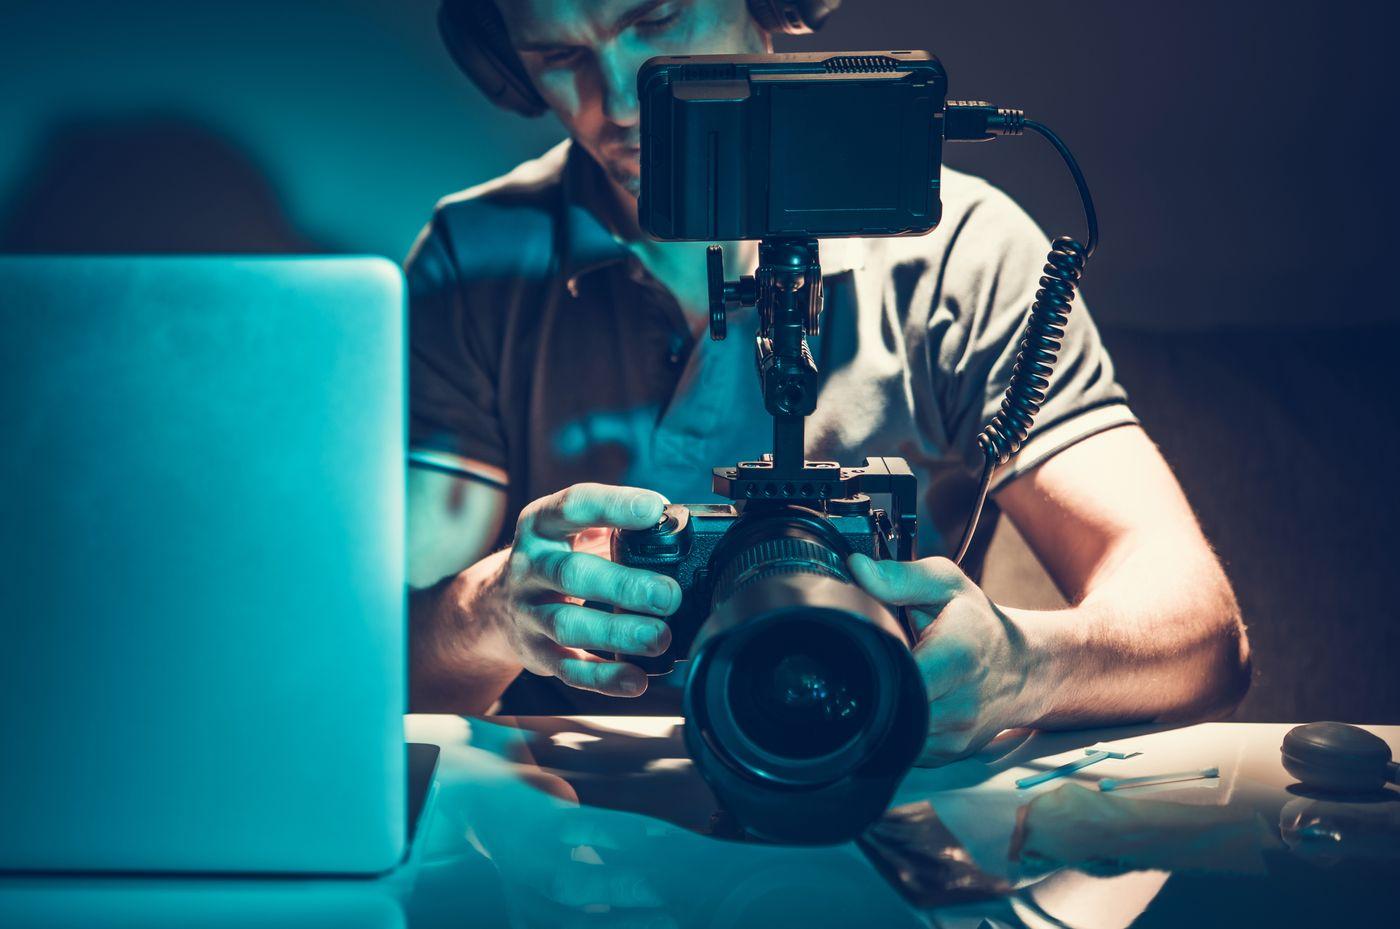 camera-operator-reviewing-video-material-on-displa-TX3U84R.jpeg